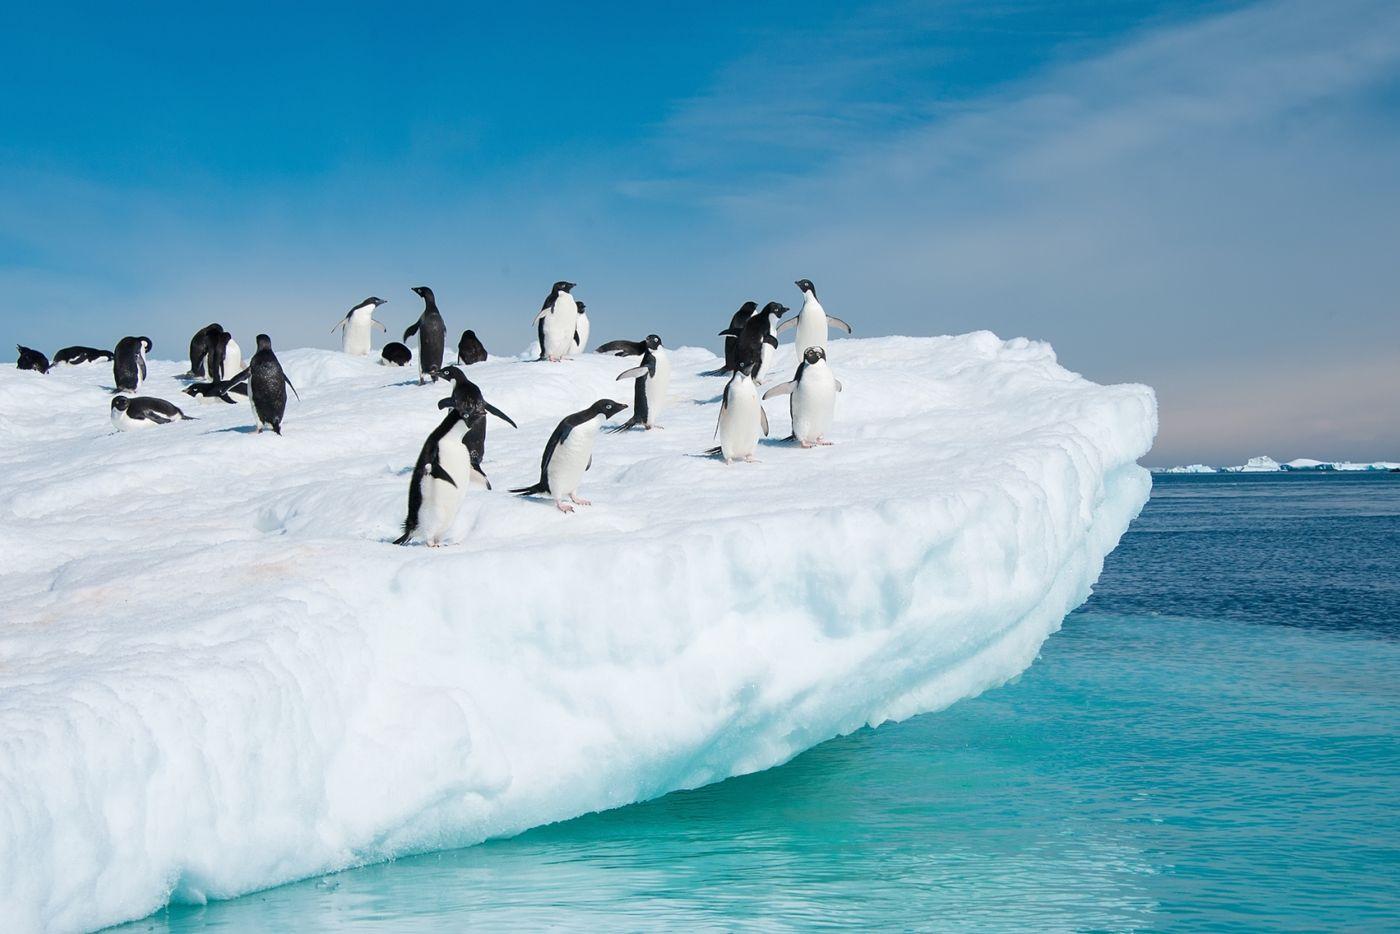 Photo Tour of Antarctica 4